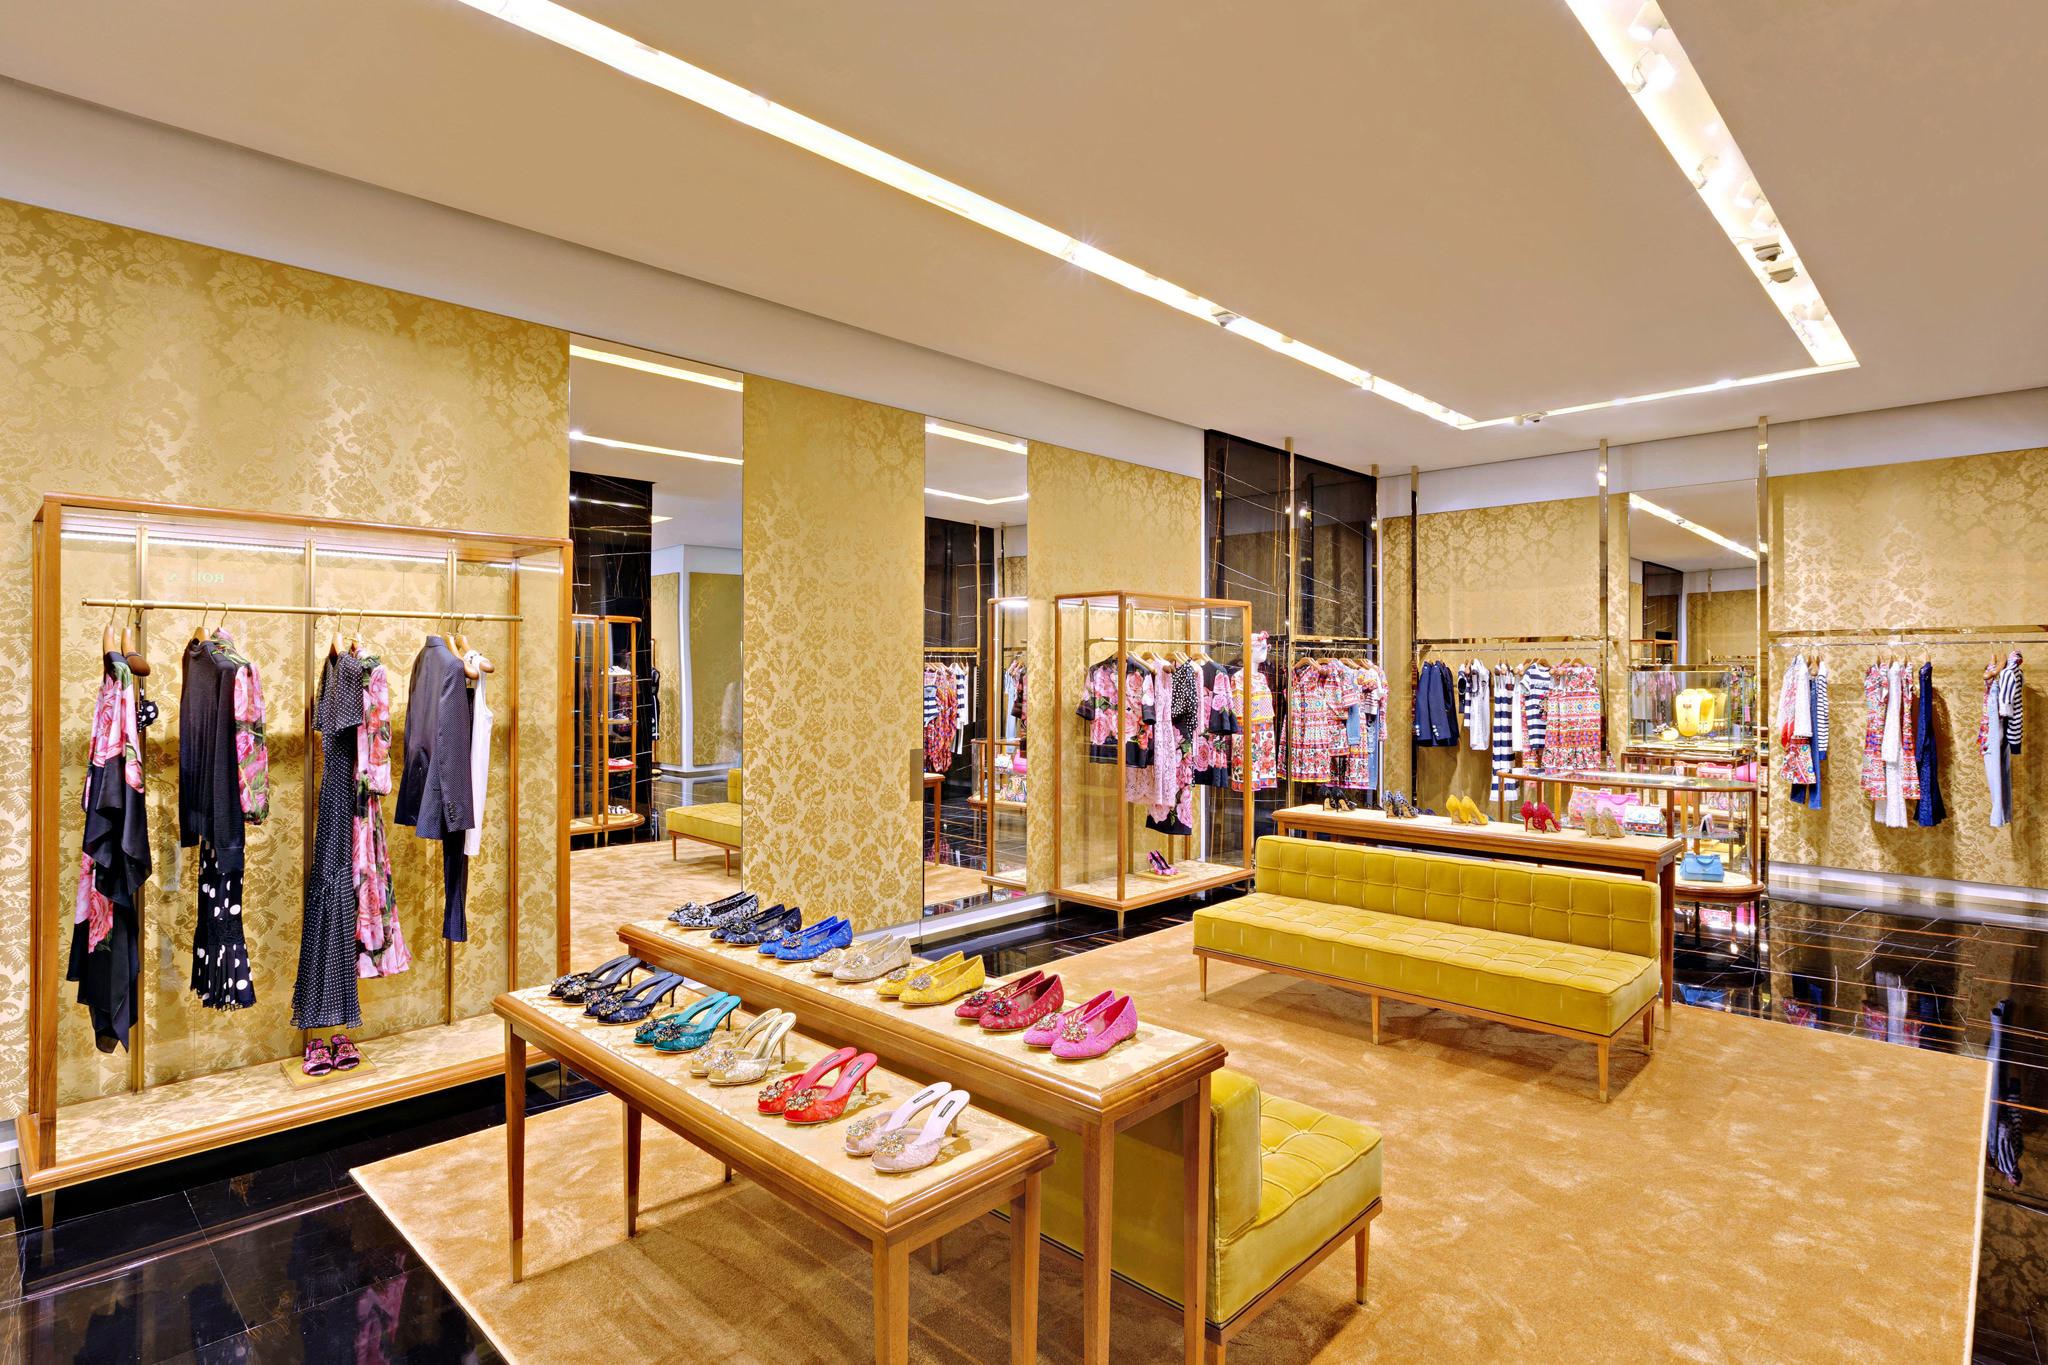 20170519 - Dolce & Gabbana - HCM - Commercial - Interior - Store - Retouch 0002.jpg